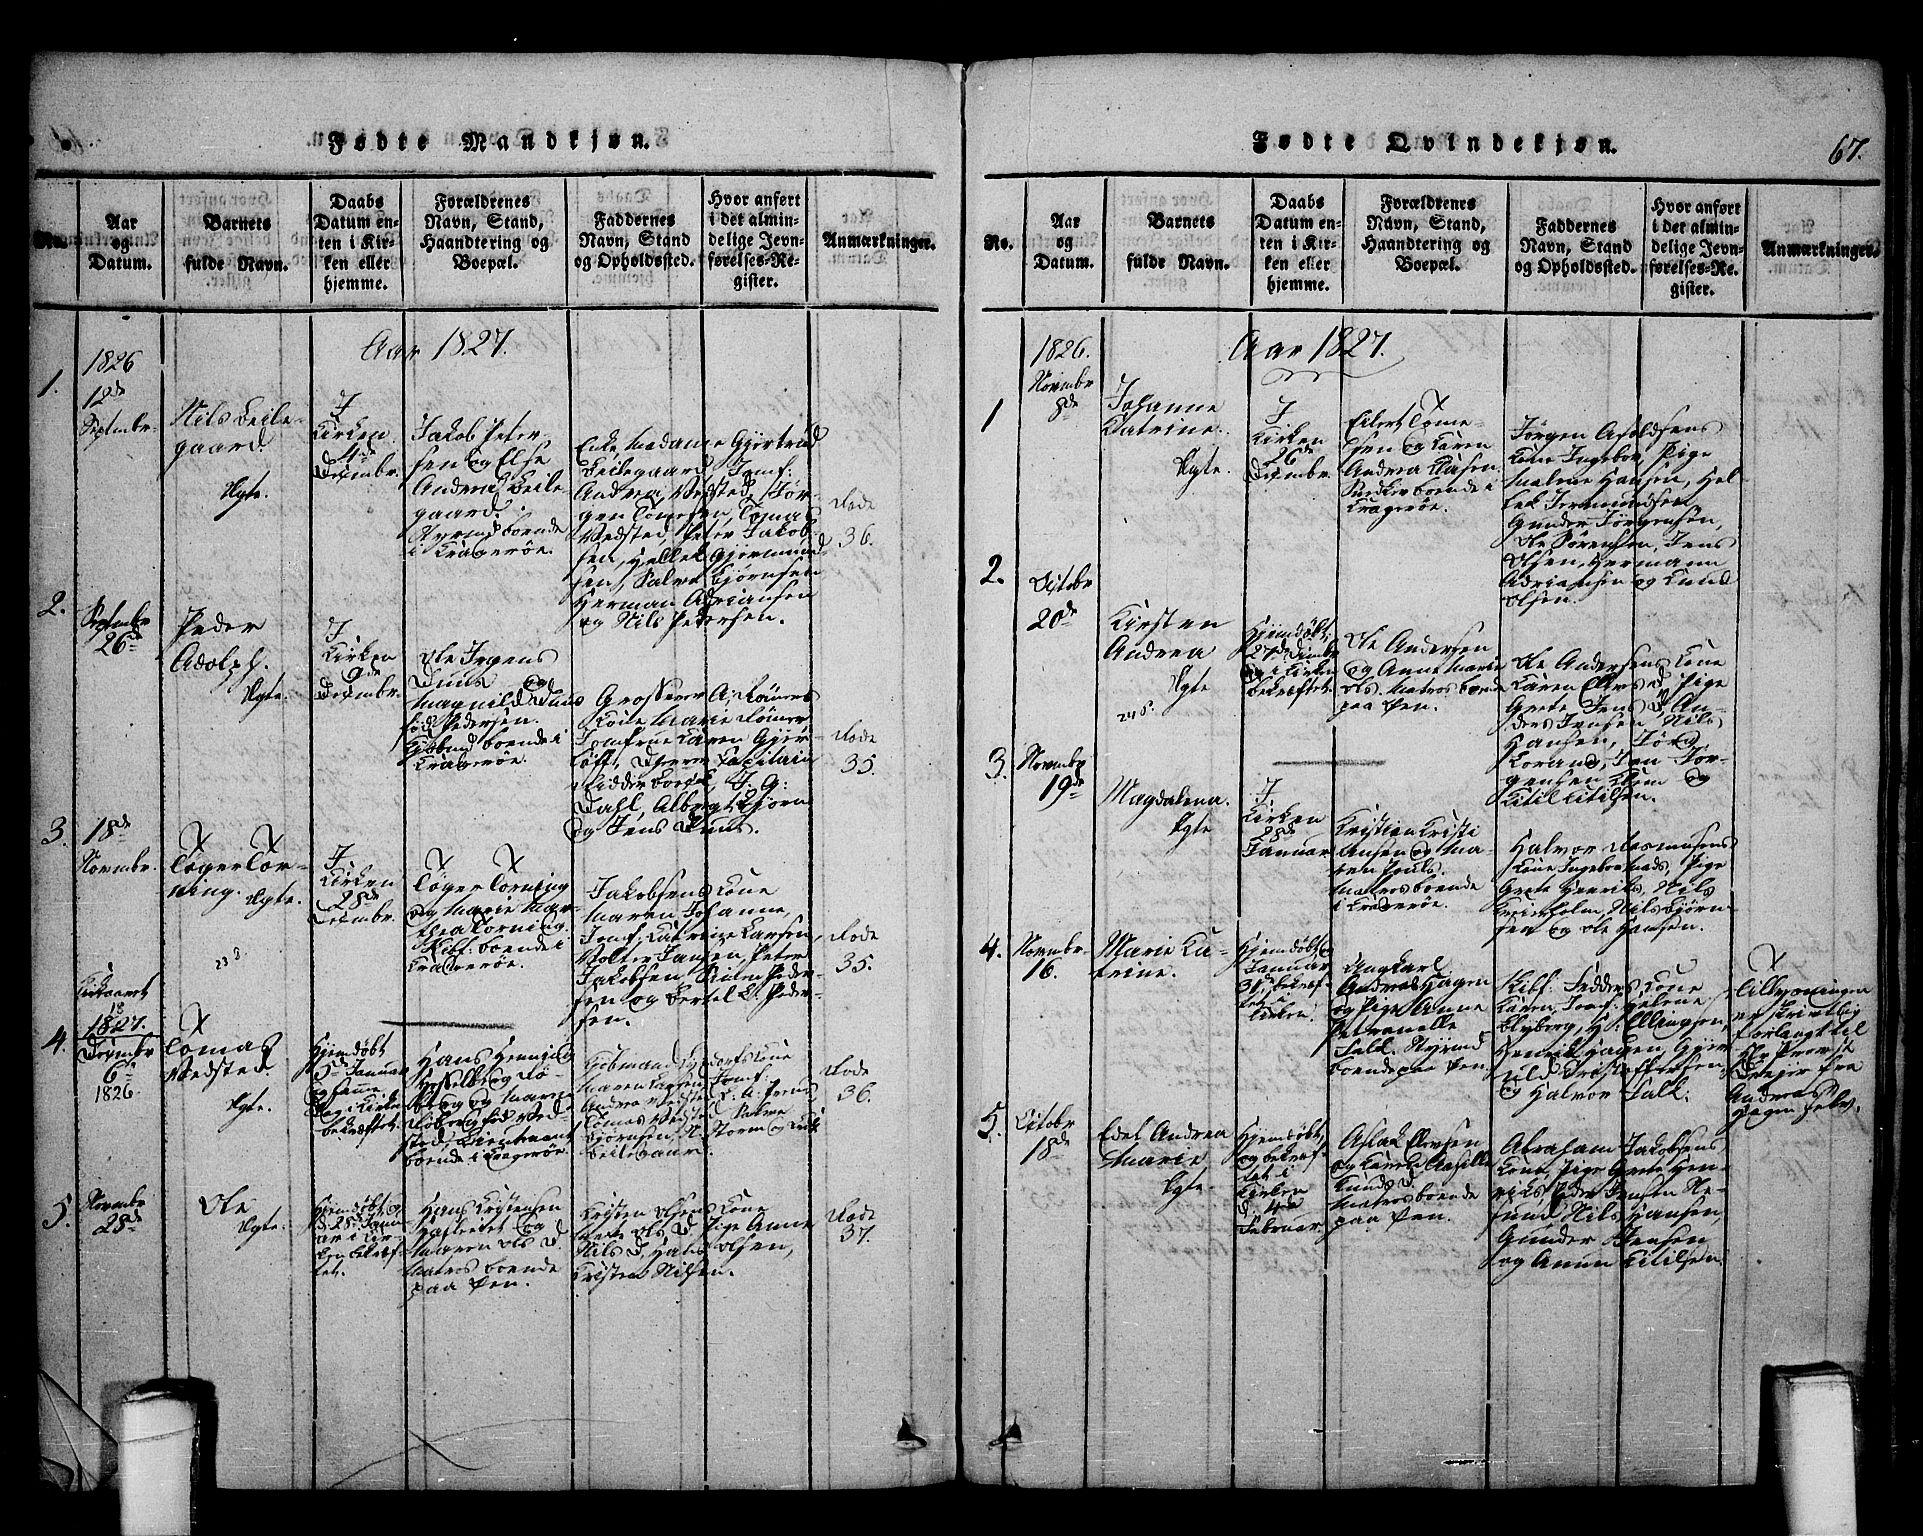 SAKO, Kragerø kirkebøker, F/Fa/L0004: Ministerialbok nr. 4, 1814-1831, s. 67